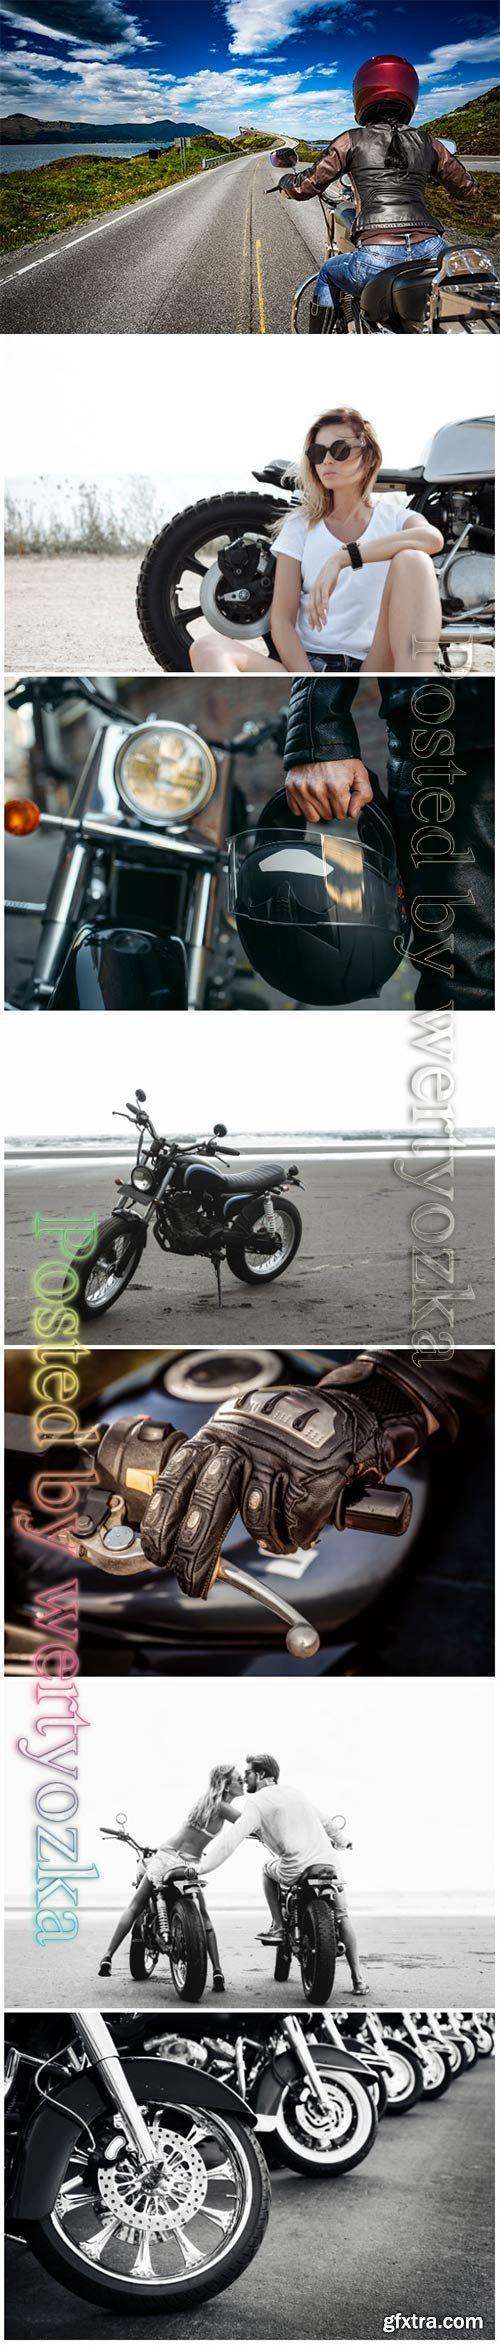 Motorcycles, biker beautiful stock photo